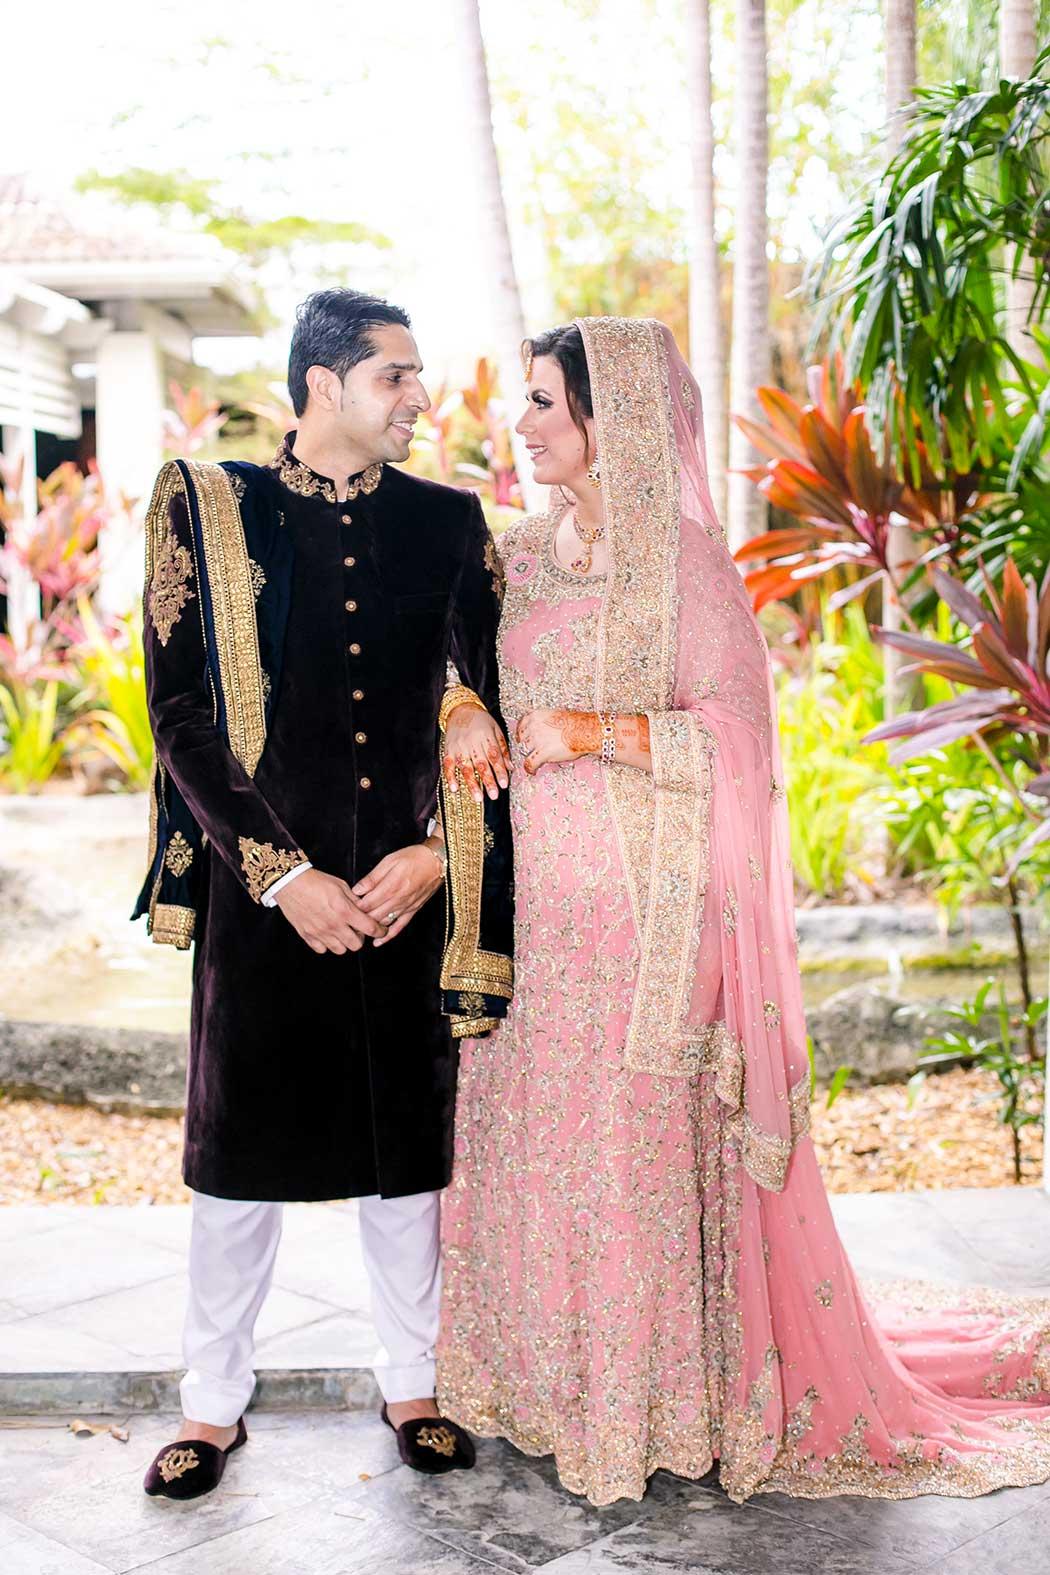 indian wedding held at bonaventure resort and spa, weston | south florida indian wedding photographer